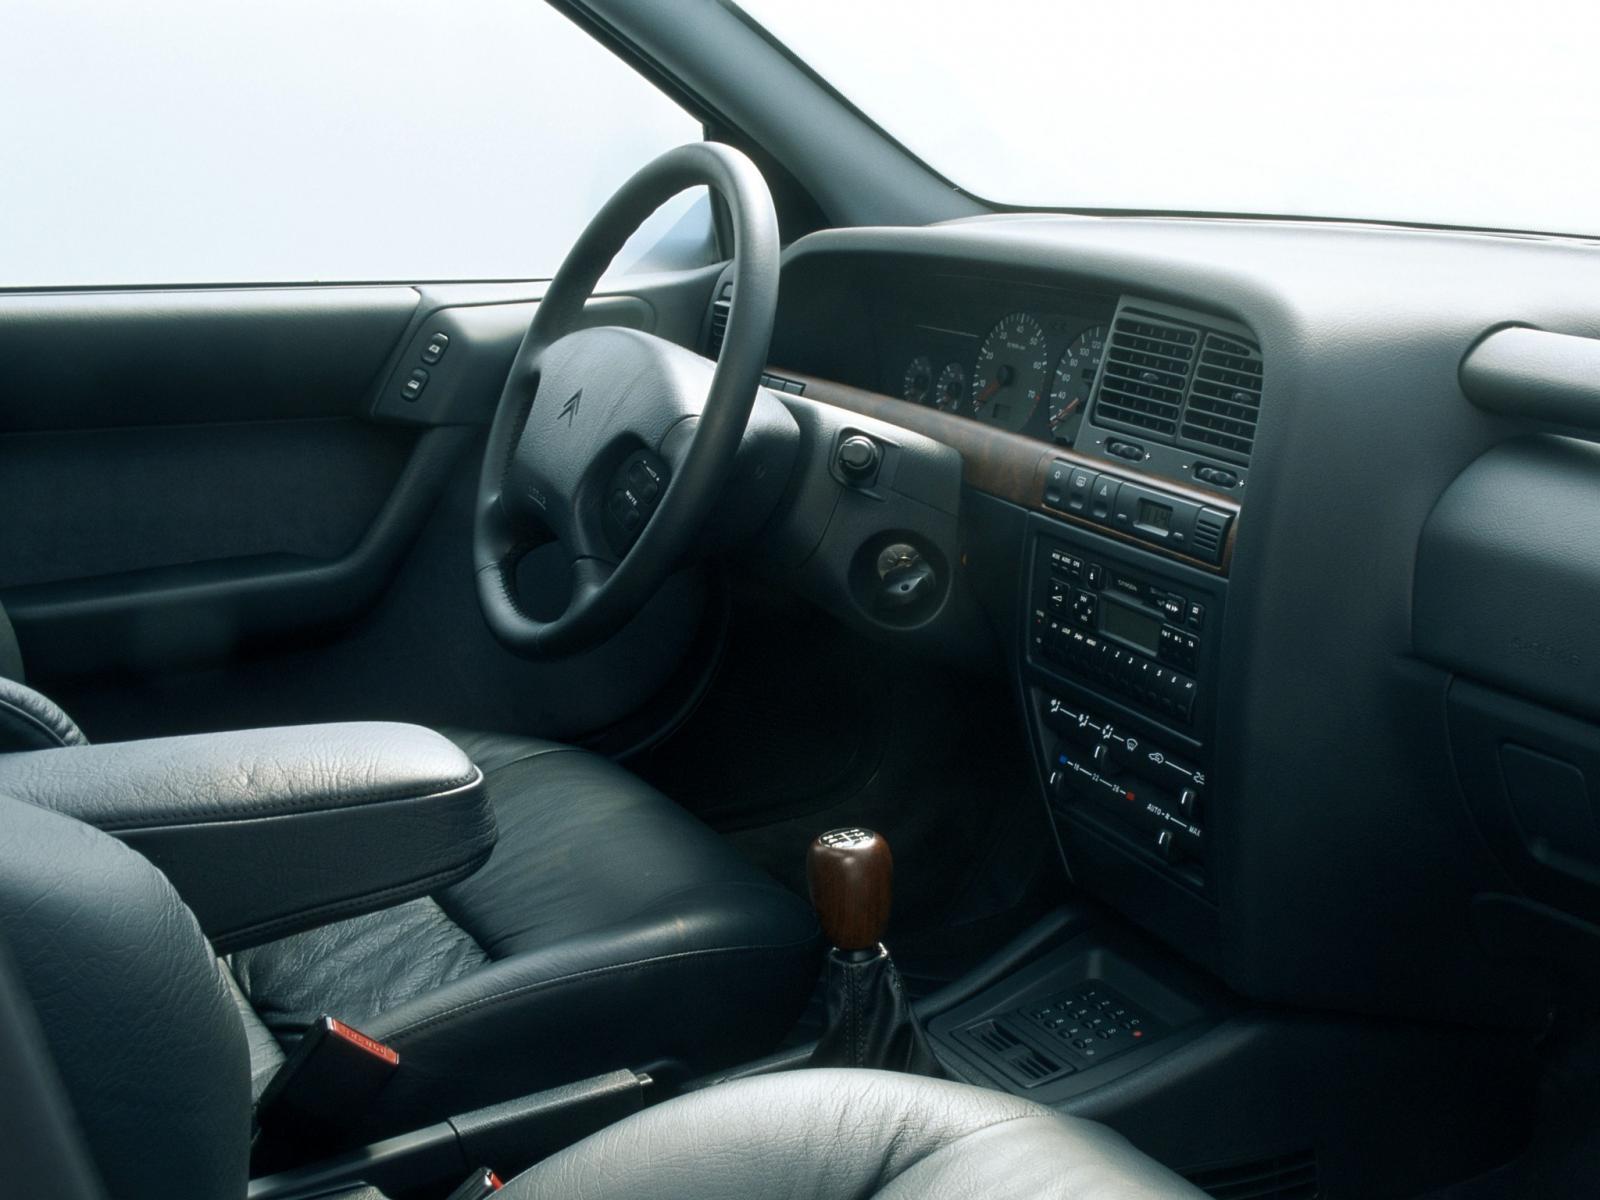 Xantia 16V Activa 1994 intérieur cuir